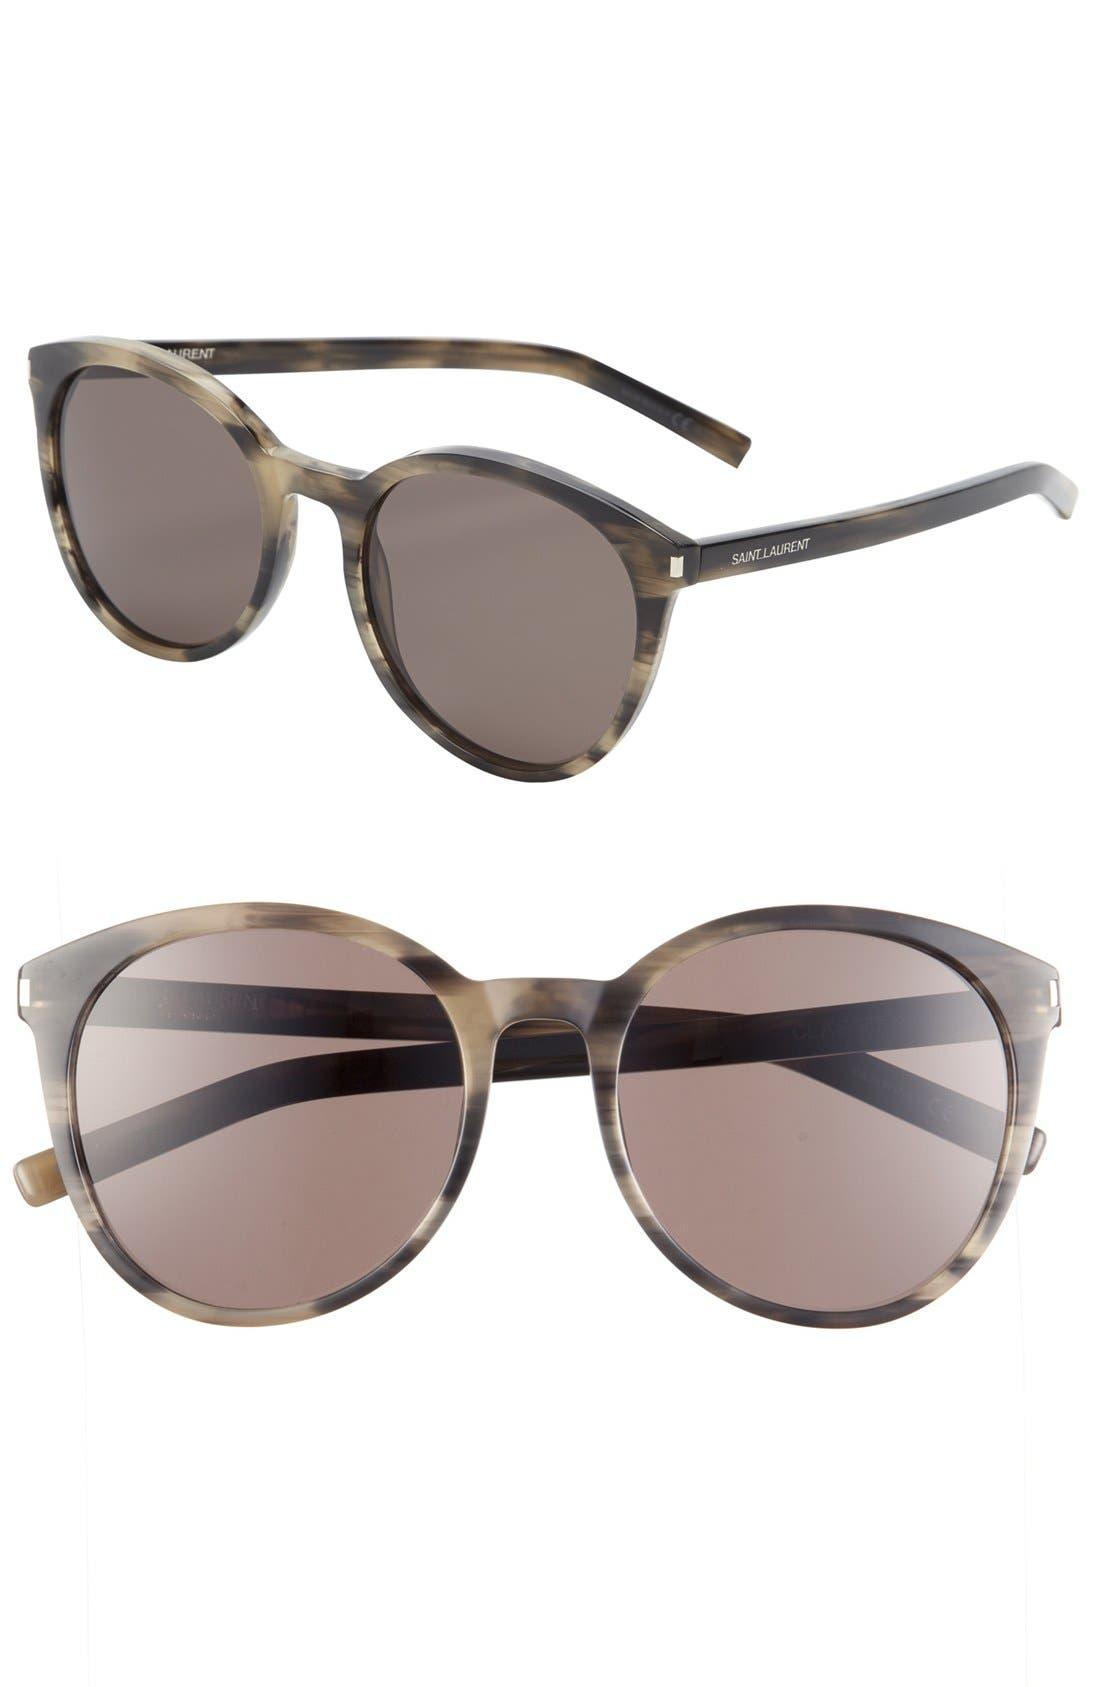 Alternate Image 1 Selected - Saint Laurent 54mm Retro Sunglasses